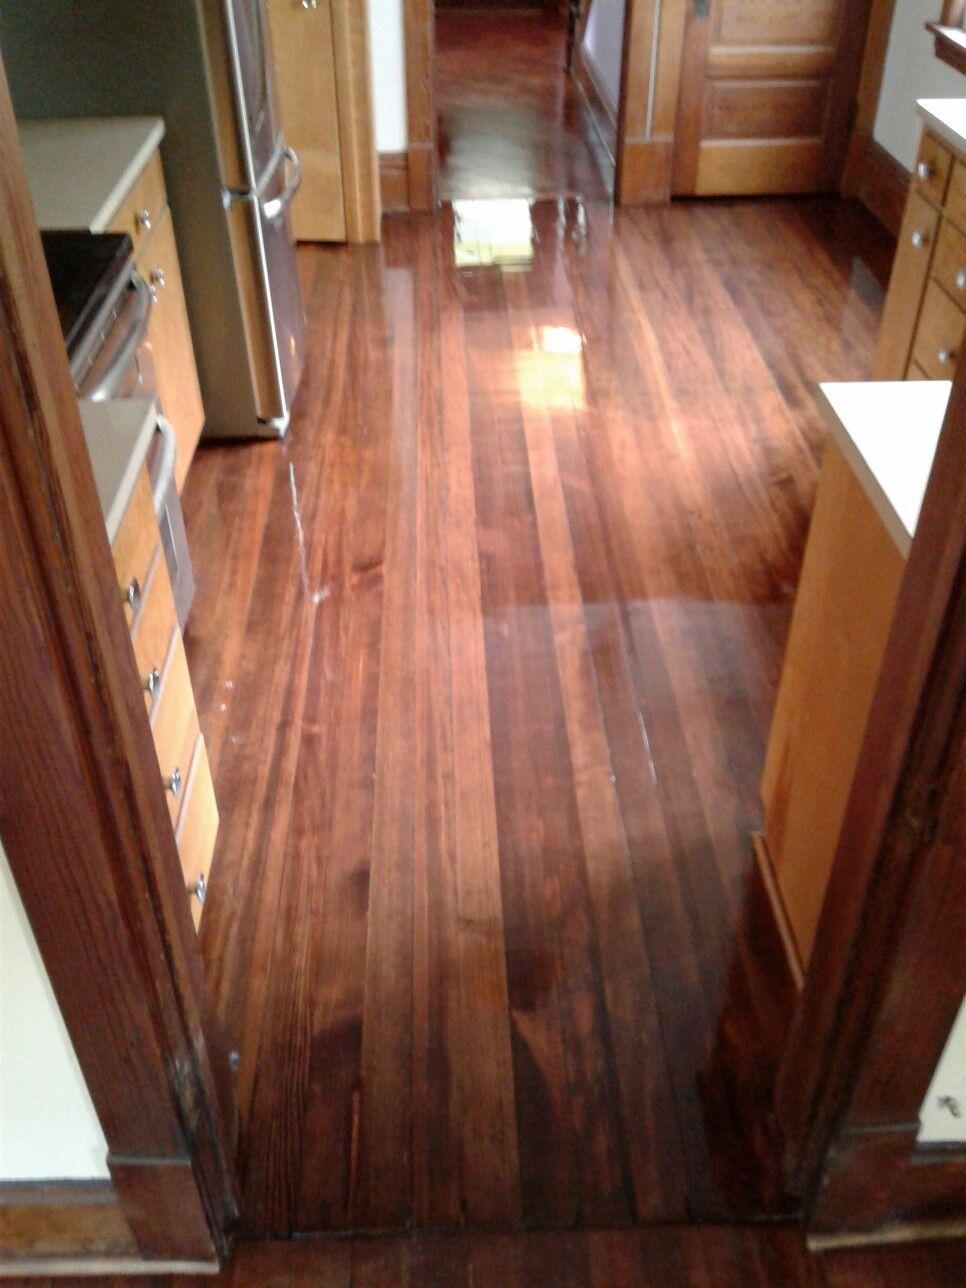 Wood Stain Hardwood Floor Colors, Sedona Mahogany Laminate Flooring